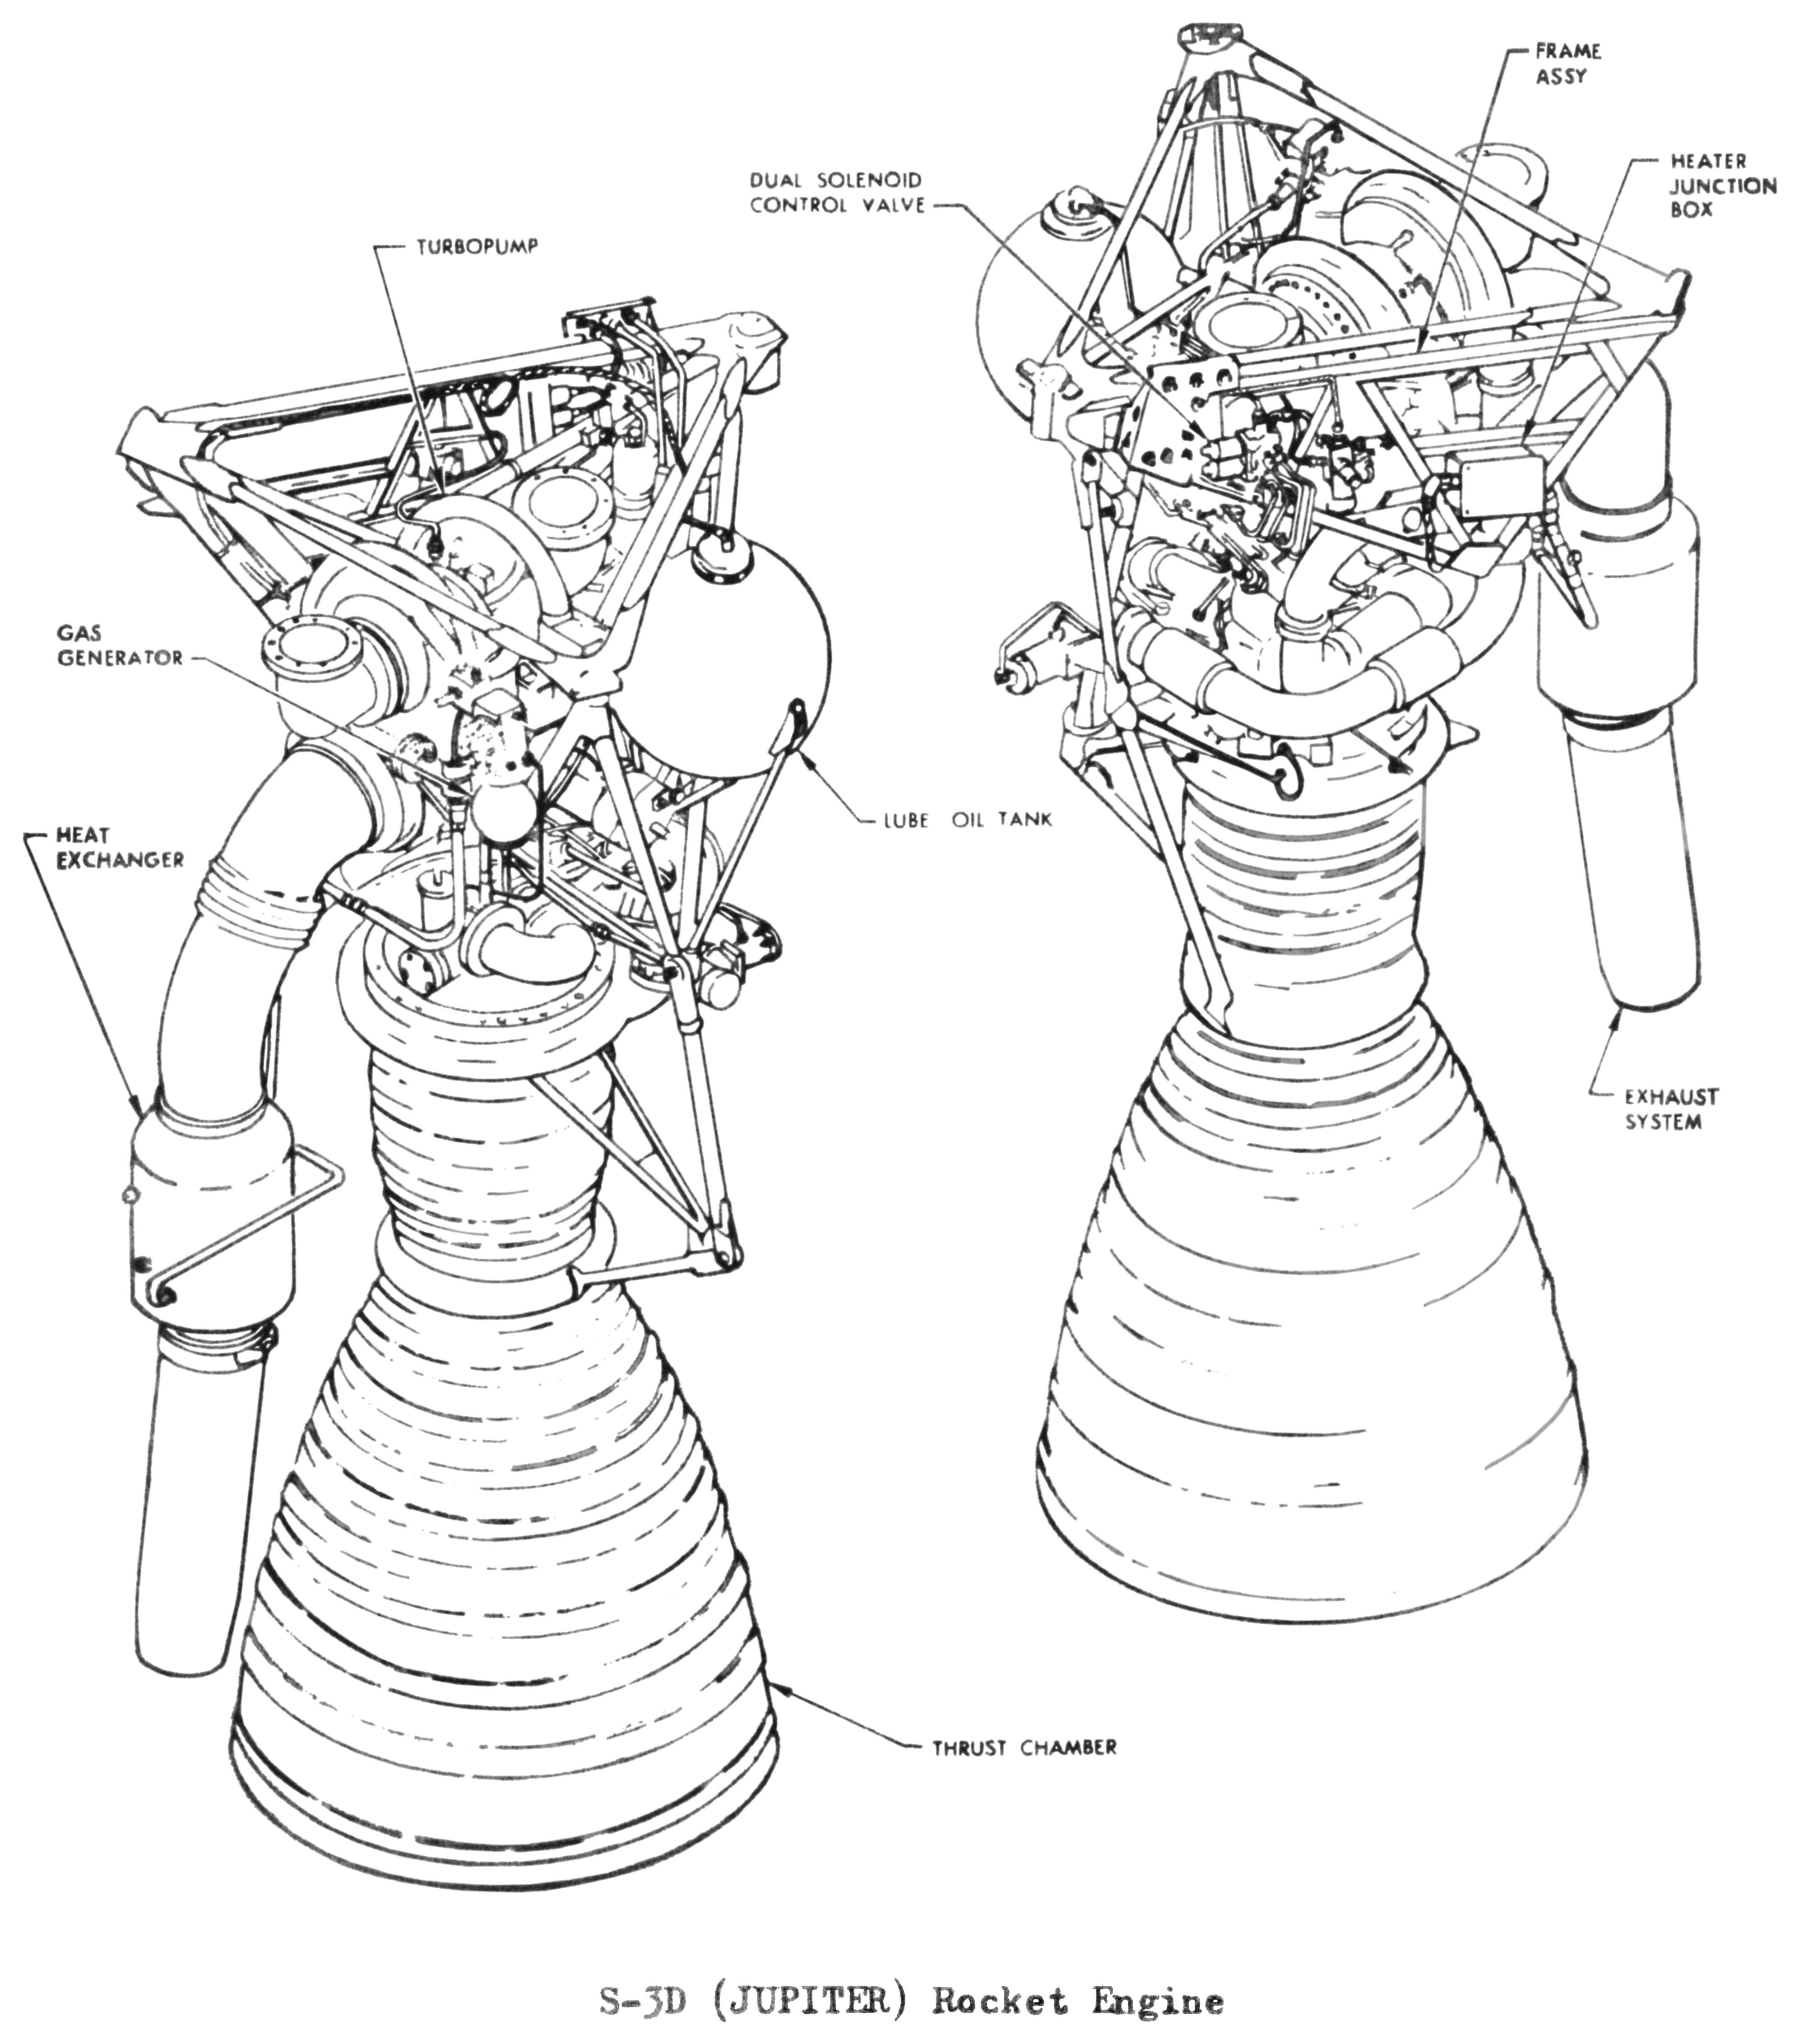 s 3d rocket engine overview